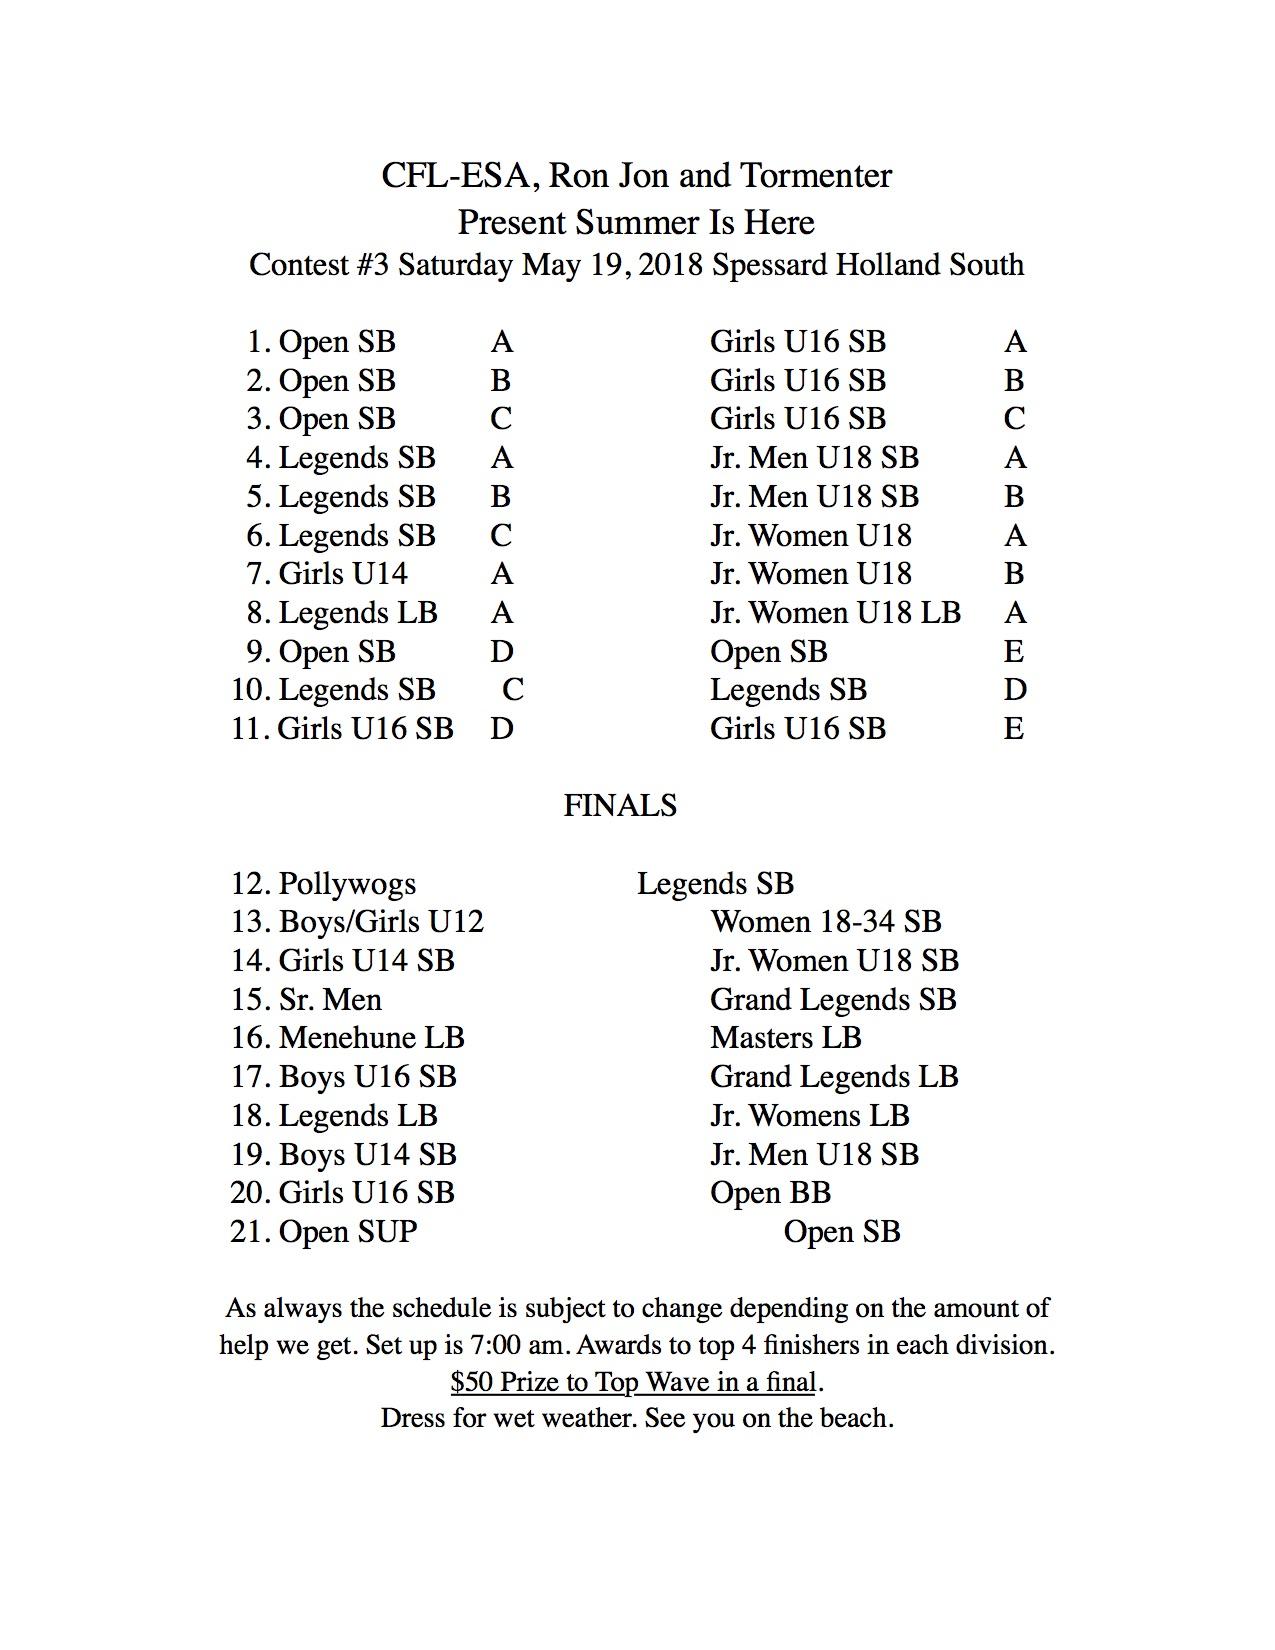 Contest #3 JPG